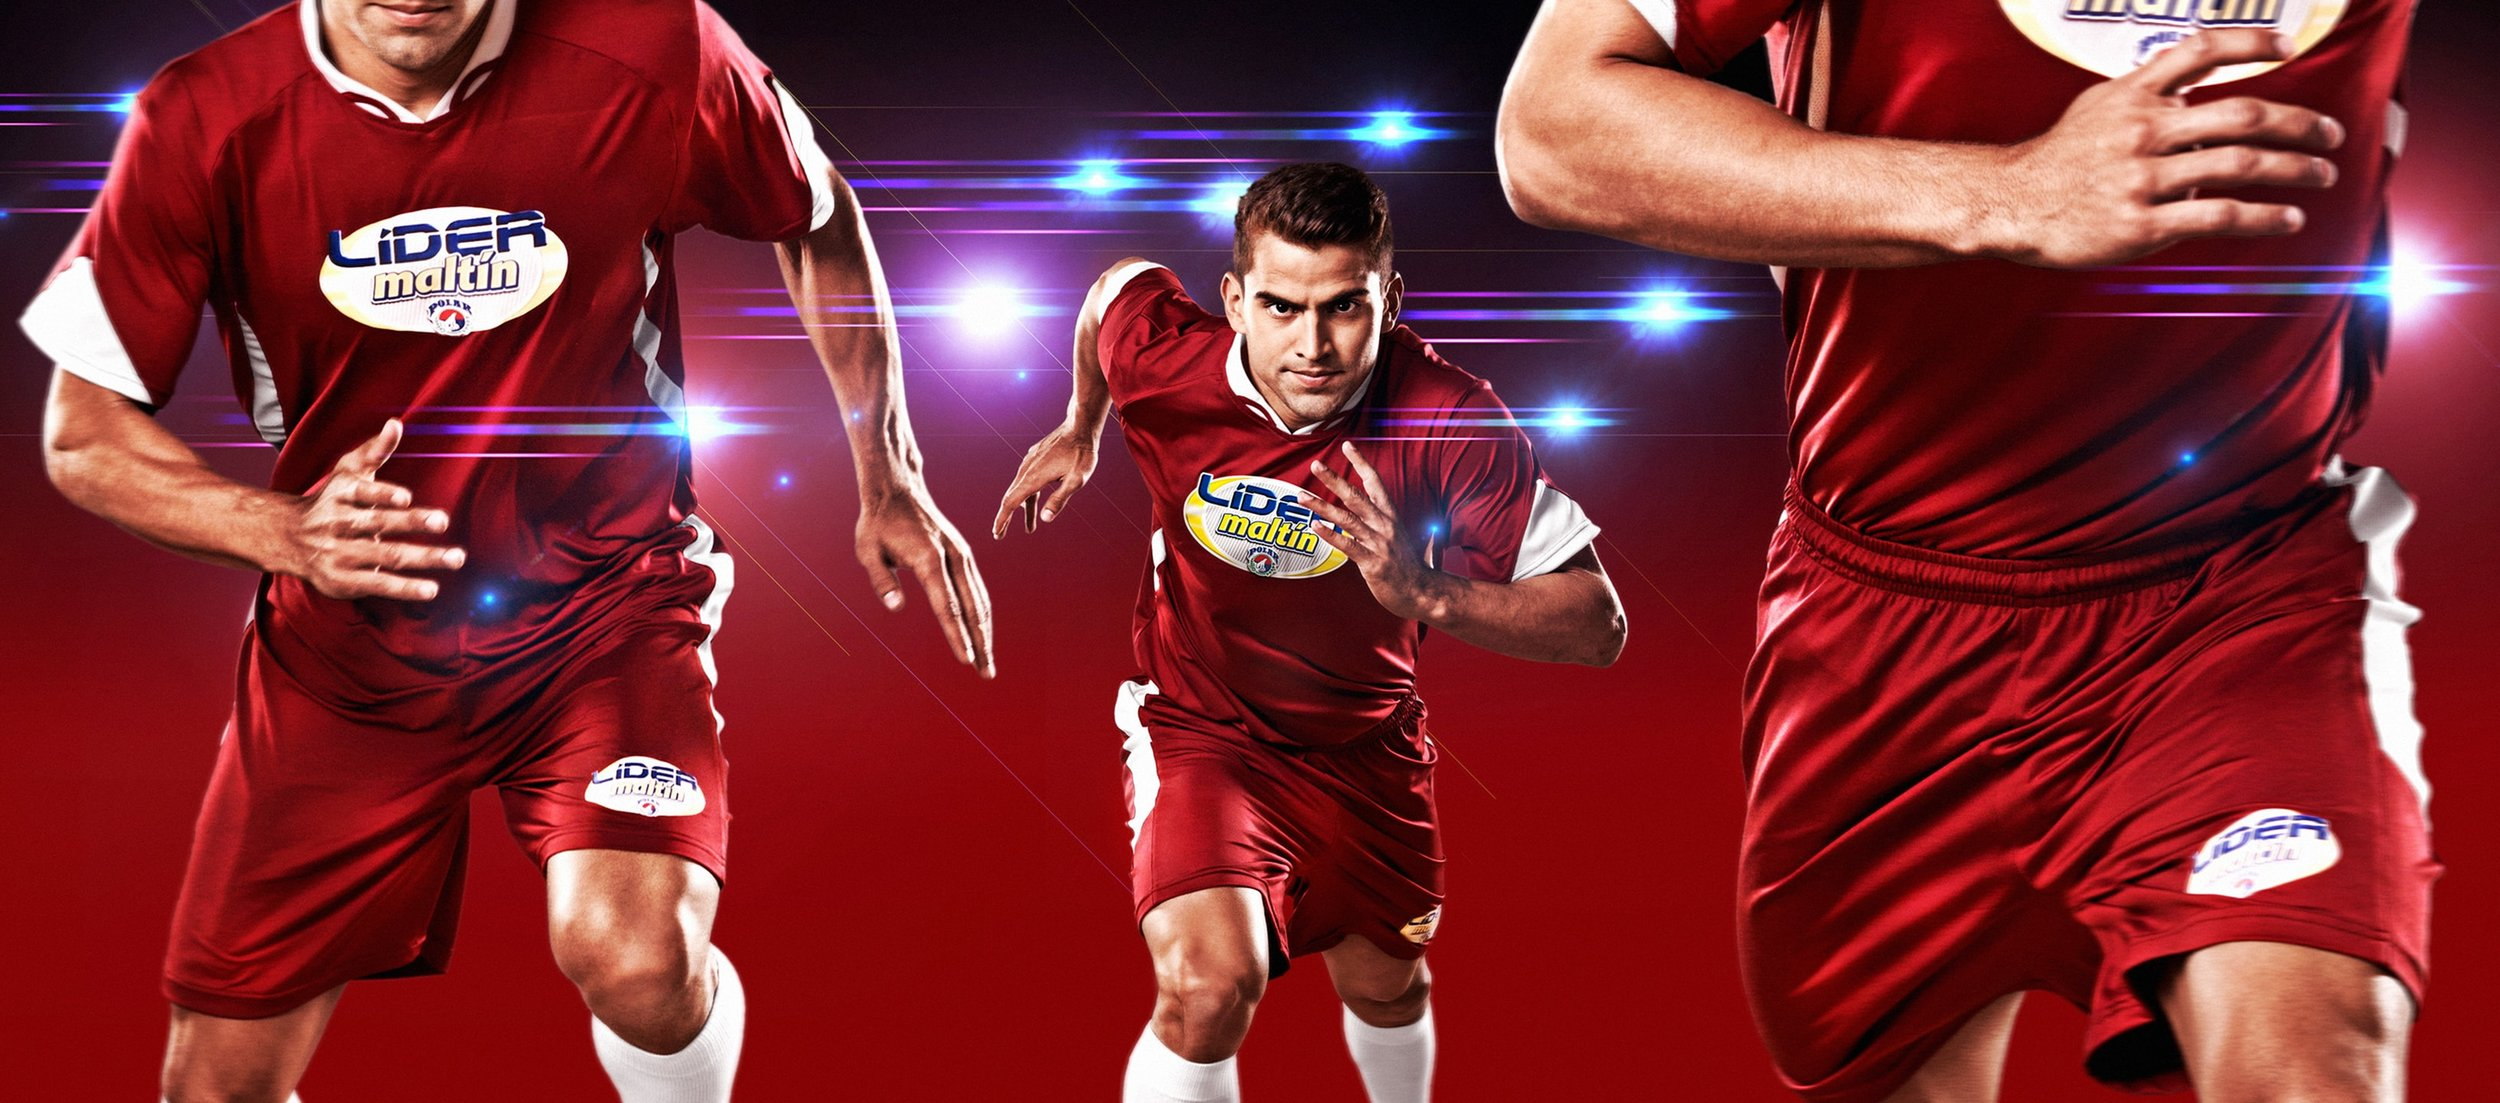 soccer-team-sports-photography-miami-marcel-boldu.jpg